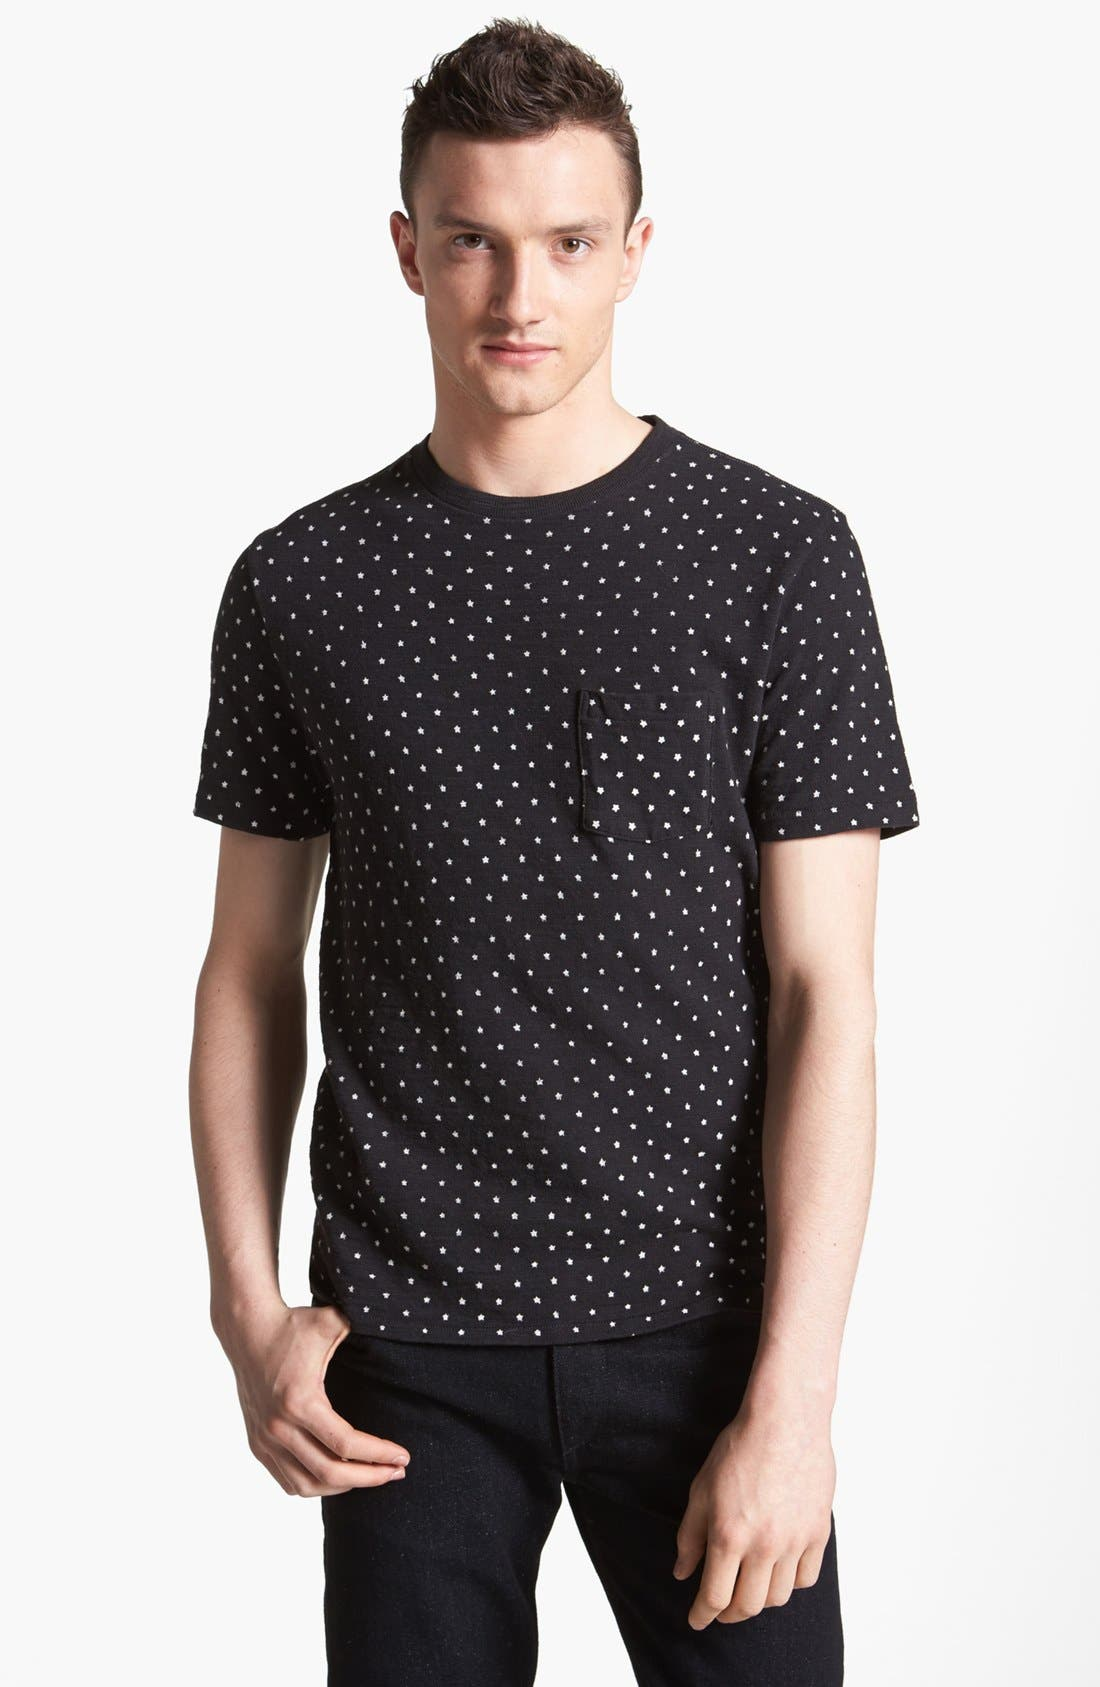 Alternate Image 1 Selected - rag & bone 'Blackstar' Print T-Shirt